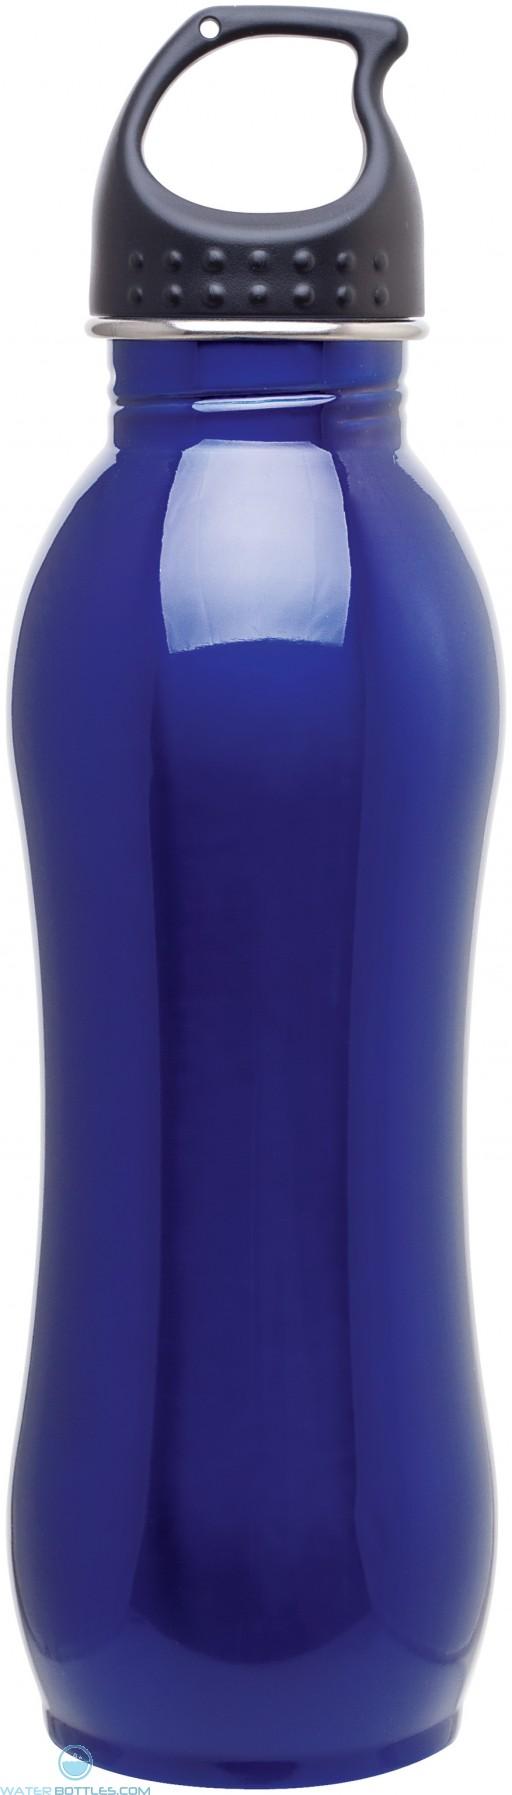 H2Go Stainless Steel Balance   24 oz - Blue